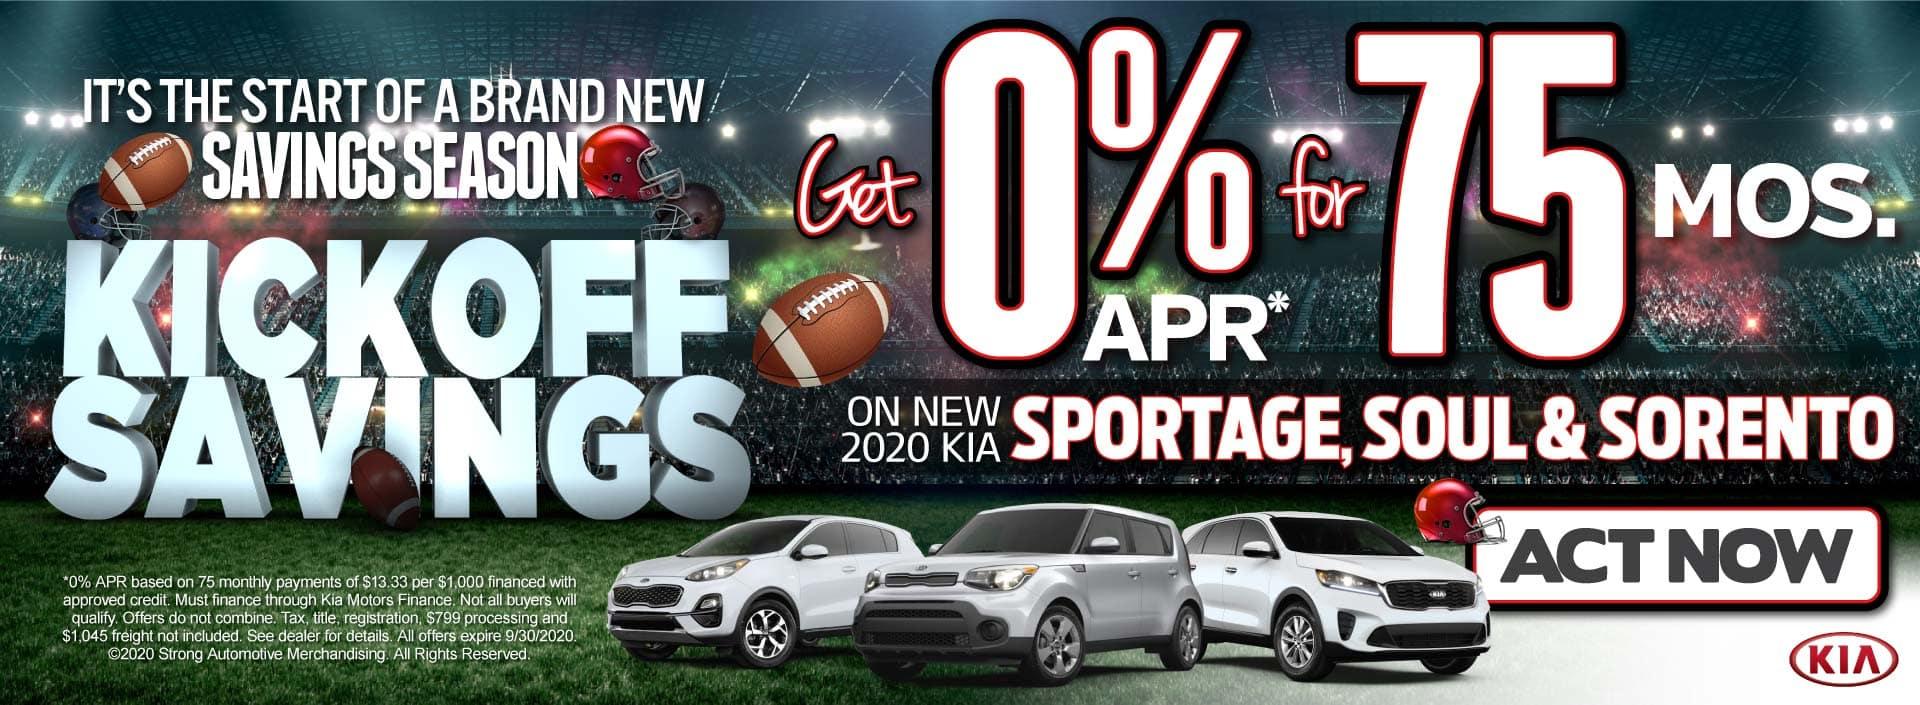 Sportage, Soul & Sorento get 0% APR for 75 mos. Act Now!